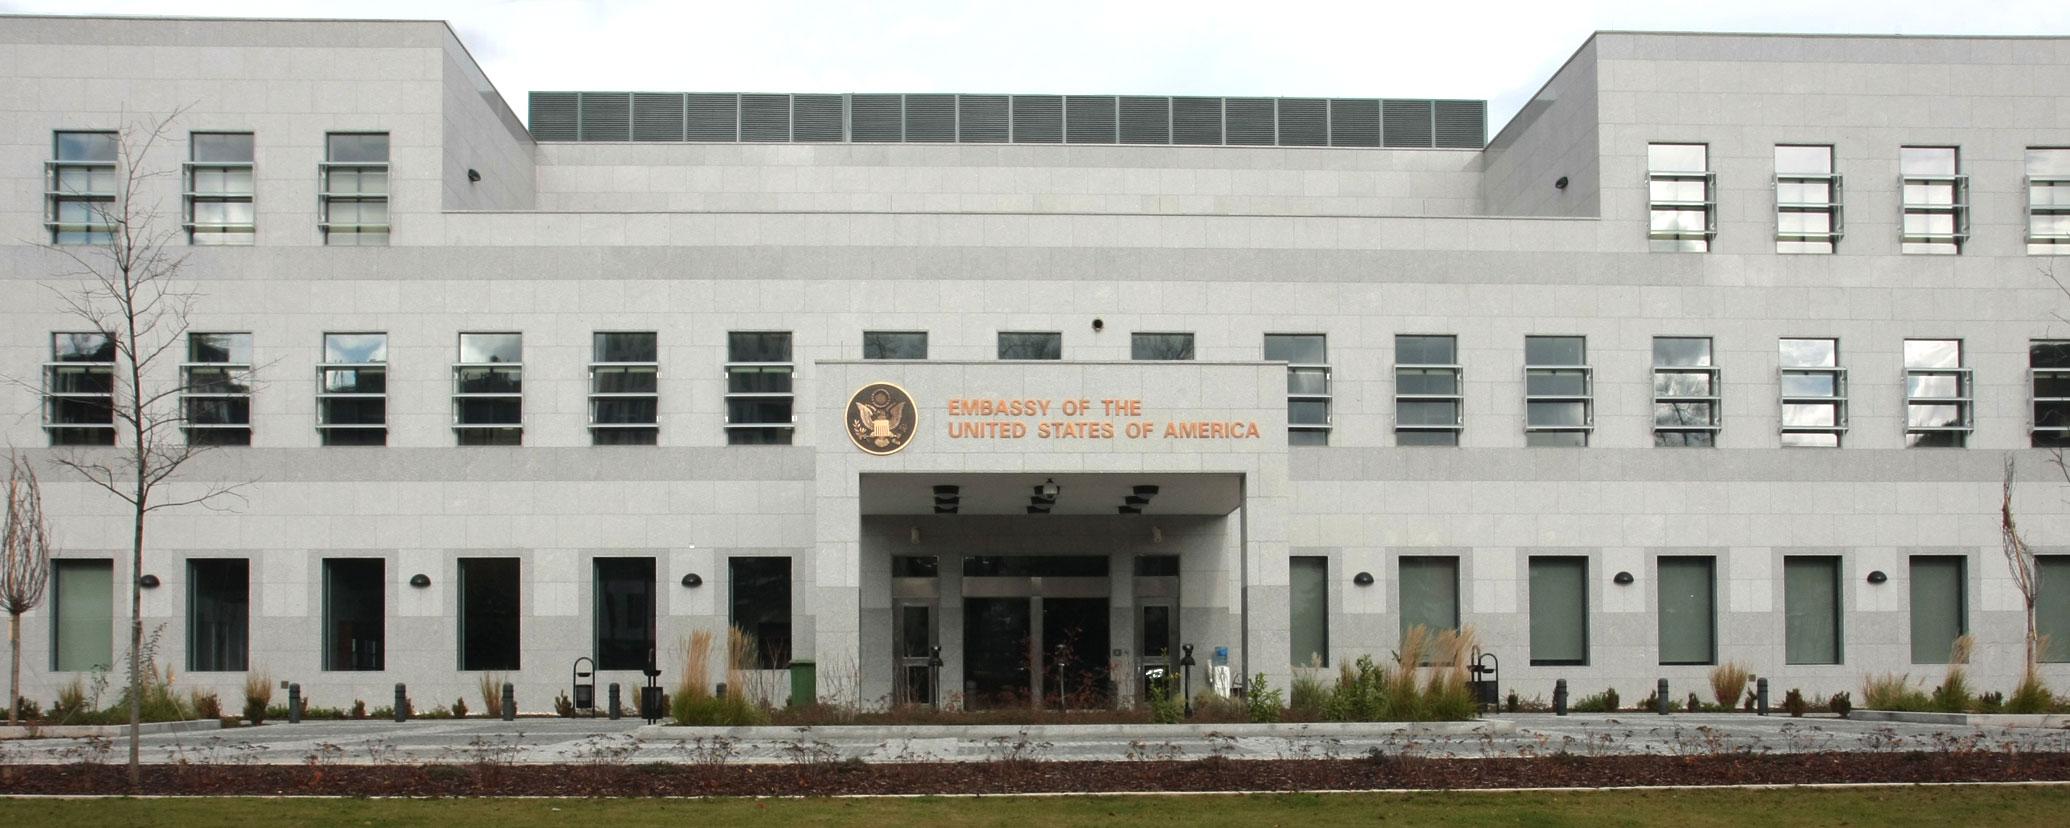 Caddell Construction Project - U.S. Embassy in Sarajevo,Bosnia